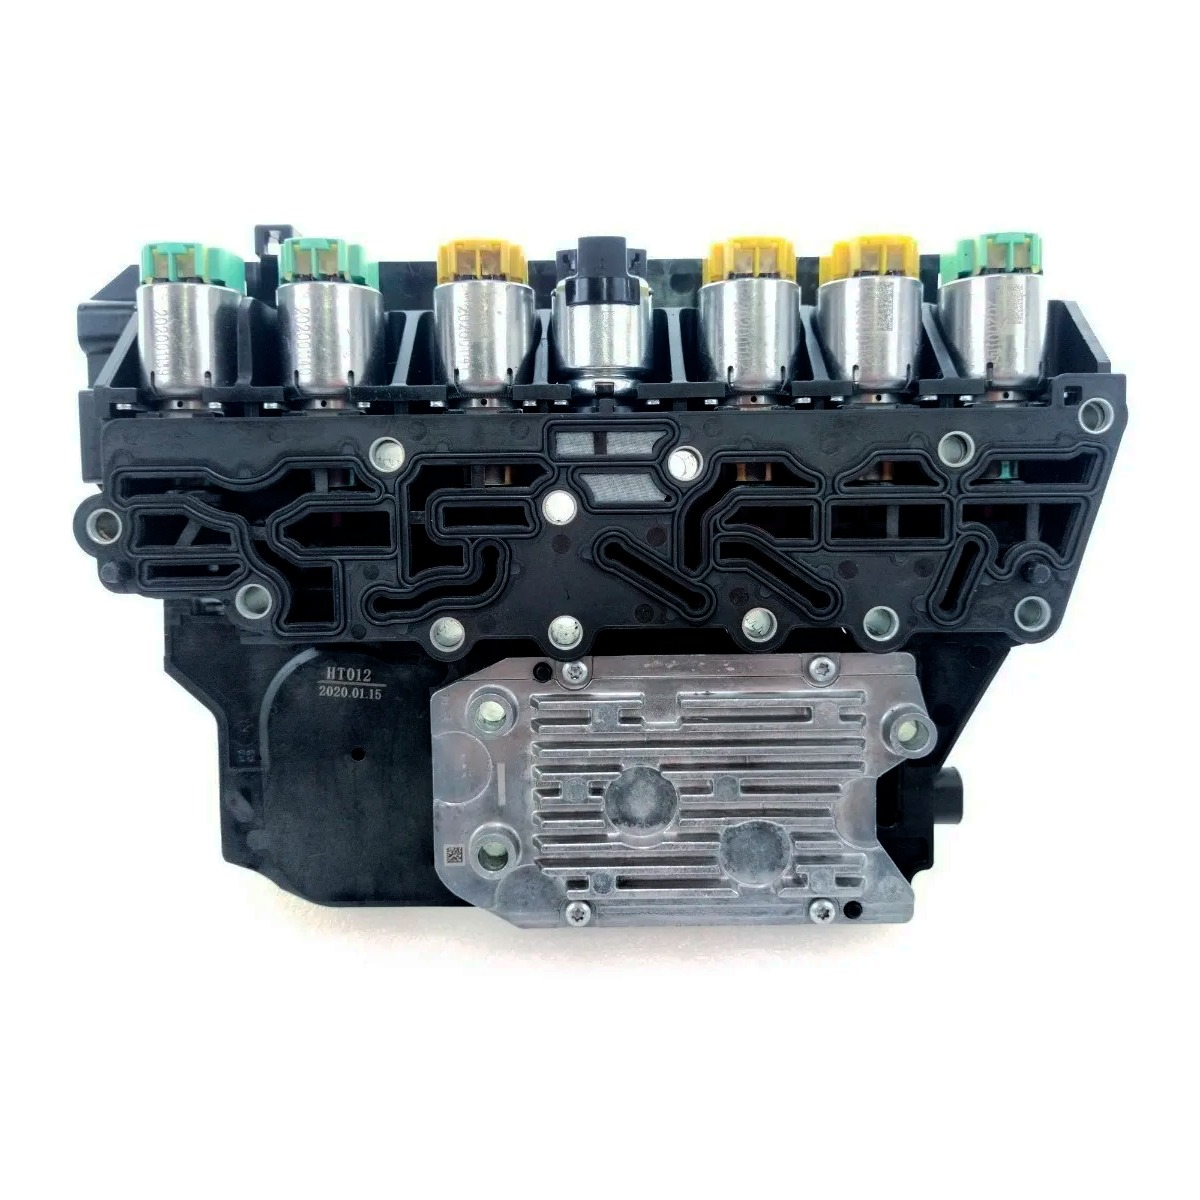 Módulo Câmbio Aut 6t30 2°gr 8164 Spin Cruze Traker Cobalt